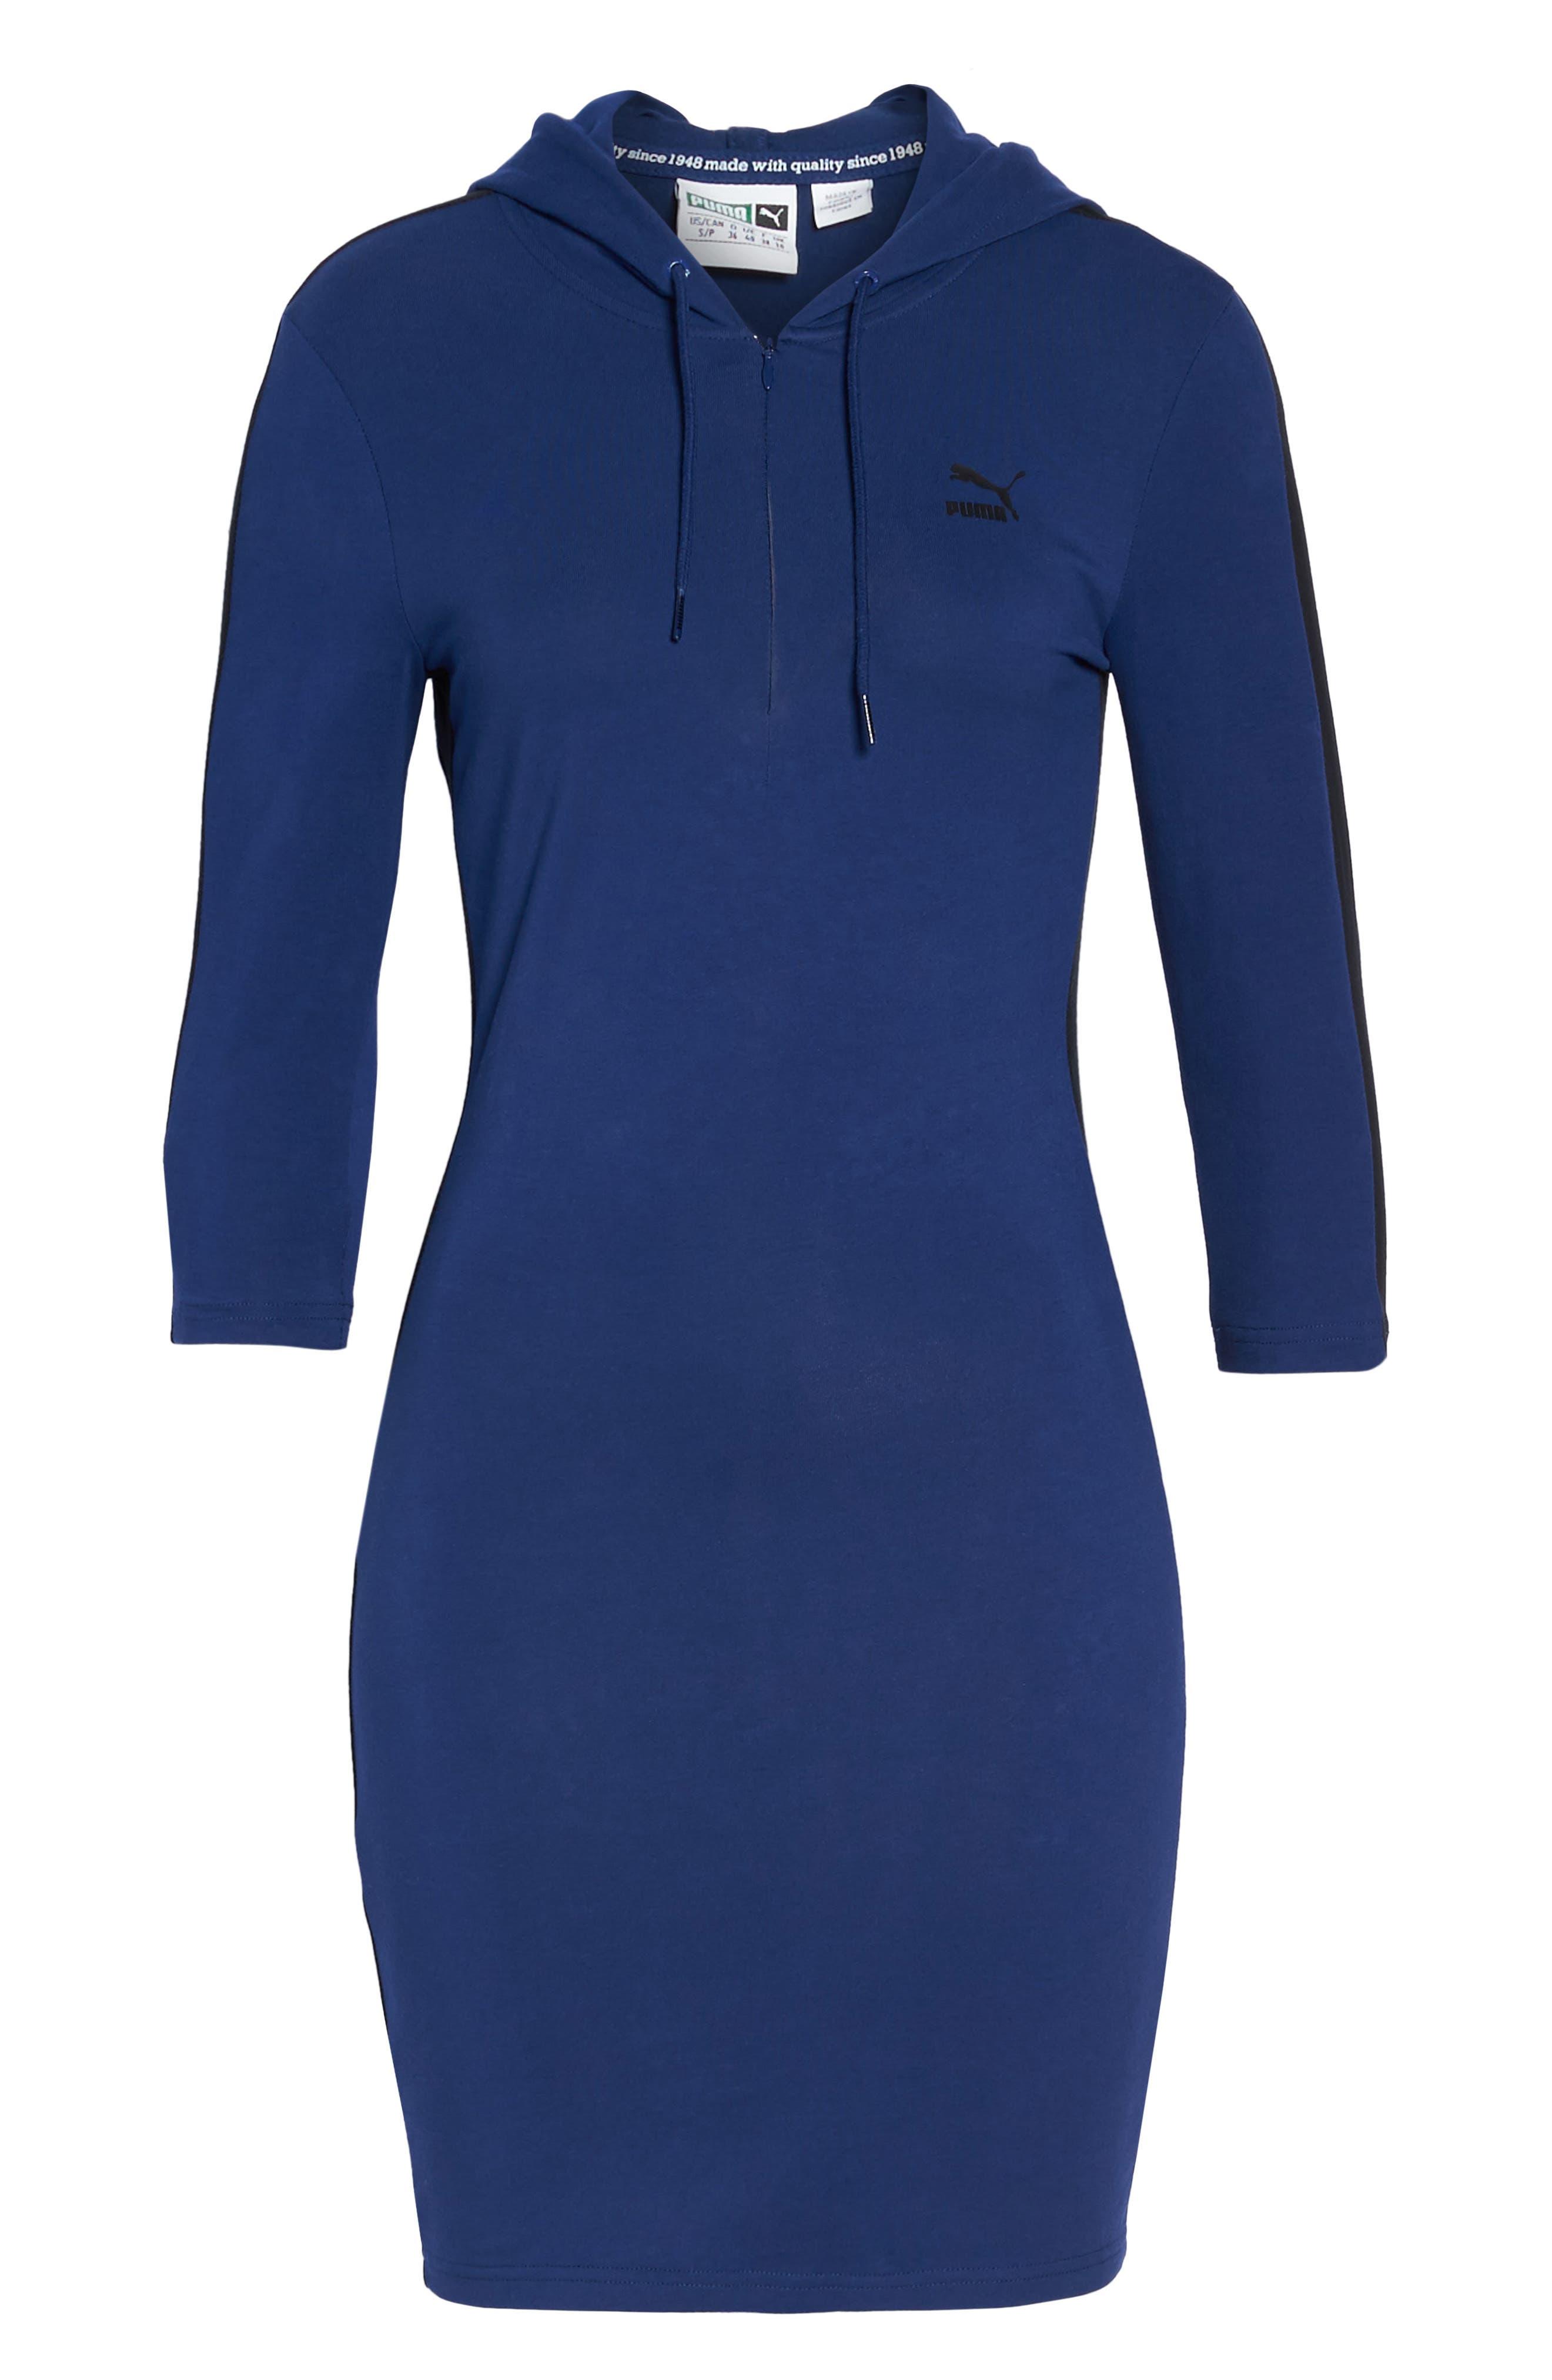 T7 Sweatshirt Dress,                             Alternate thumbnail 7, color,                             Blue Depths